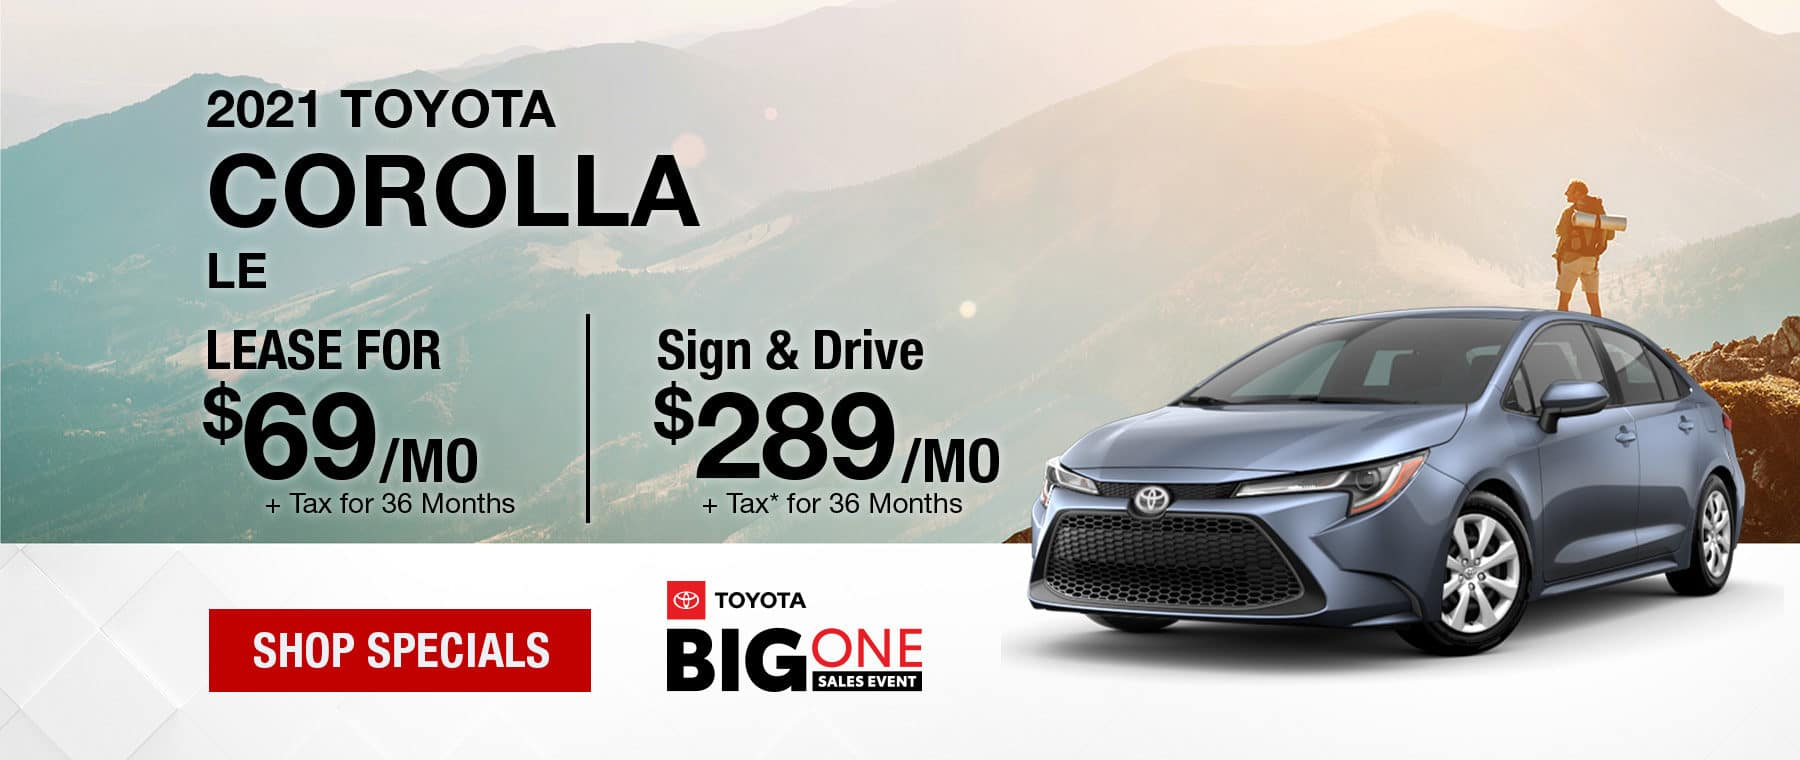 2021 Toyota Corolla Banner